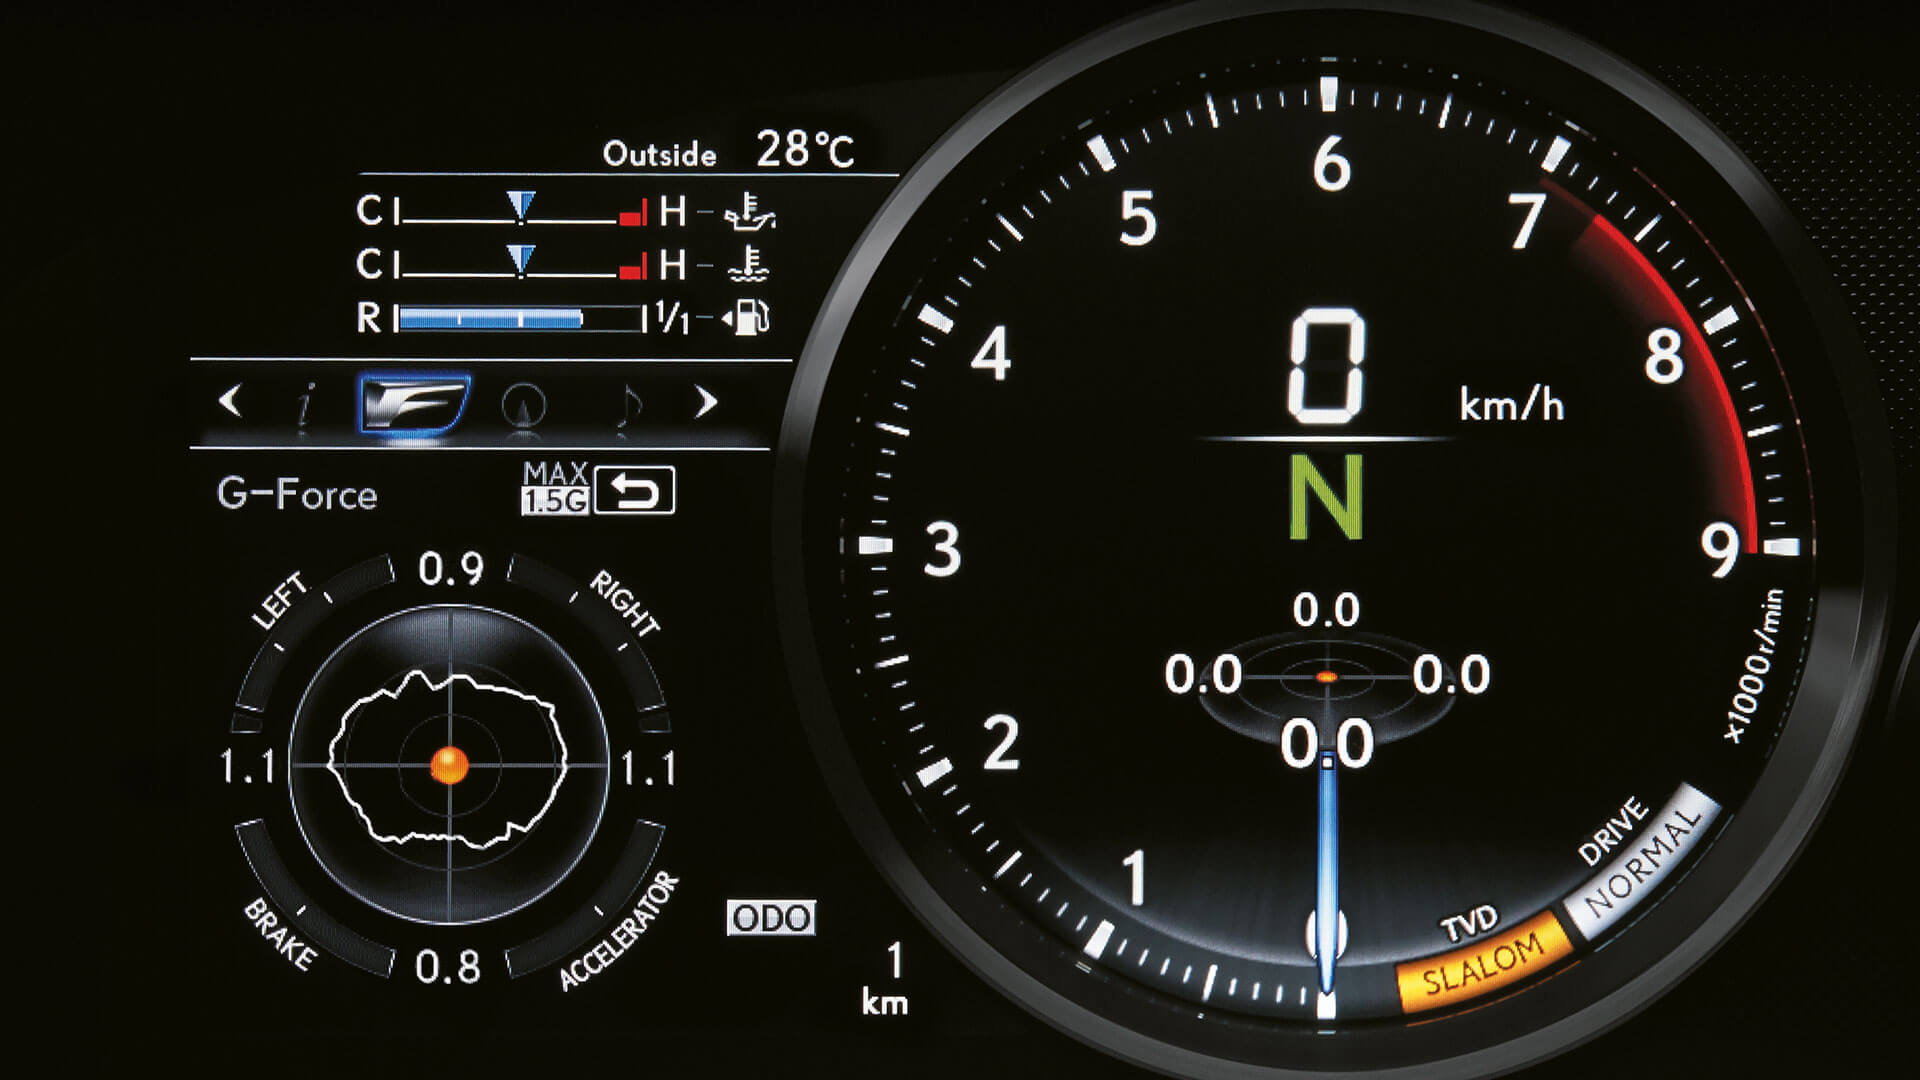 2017 lexus rc f features lfa like instruments